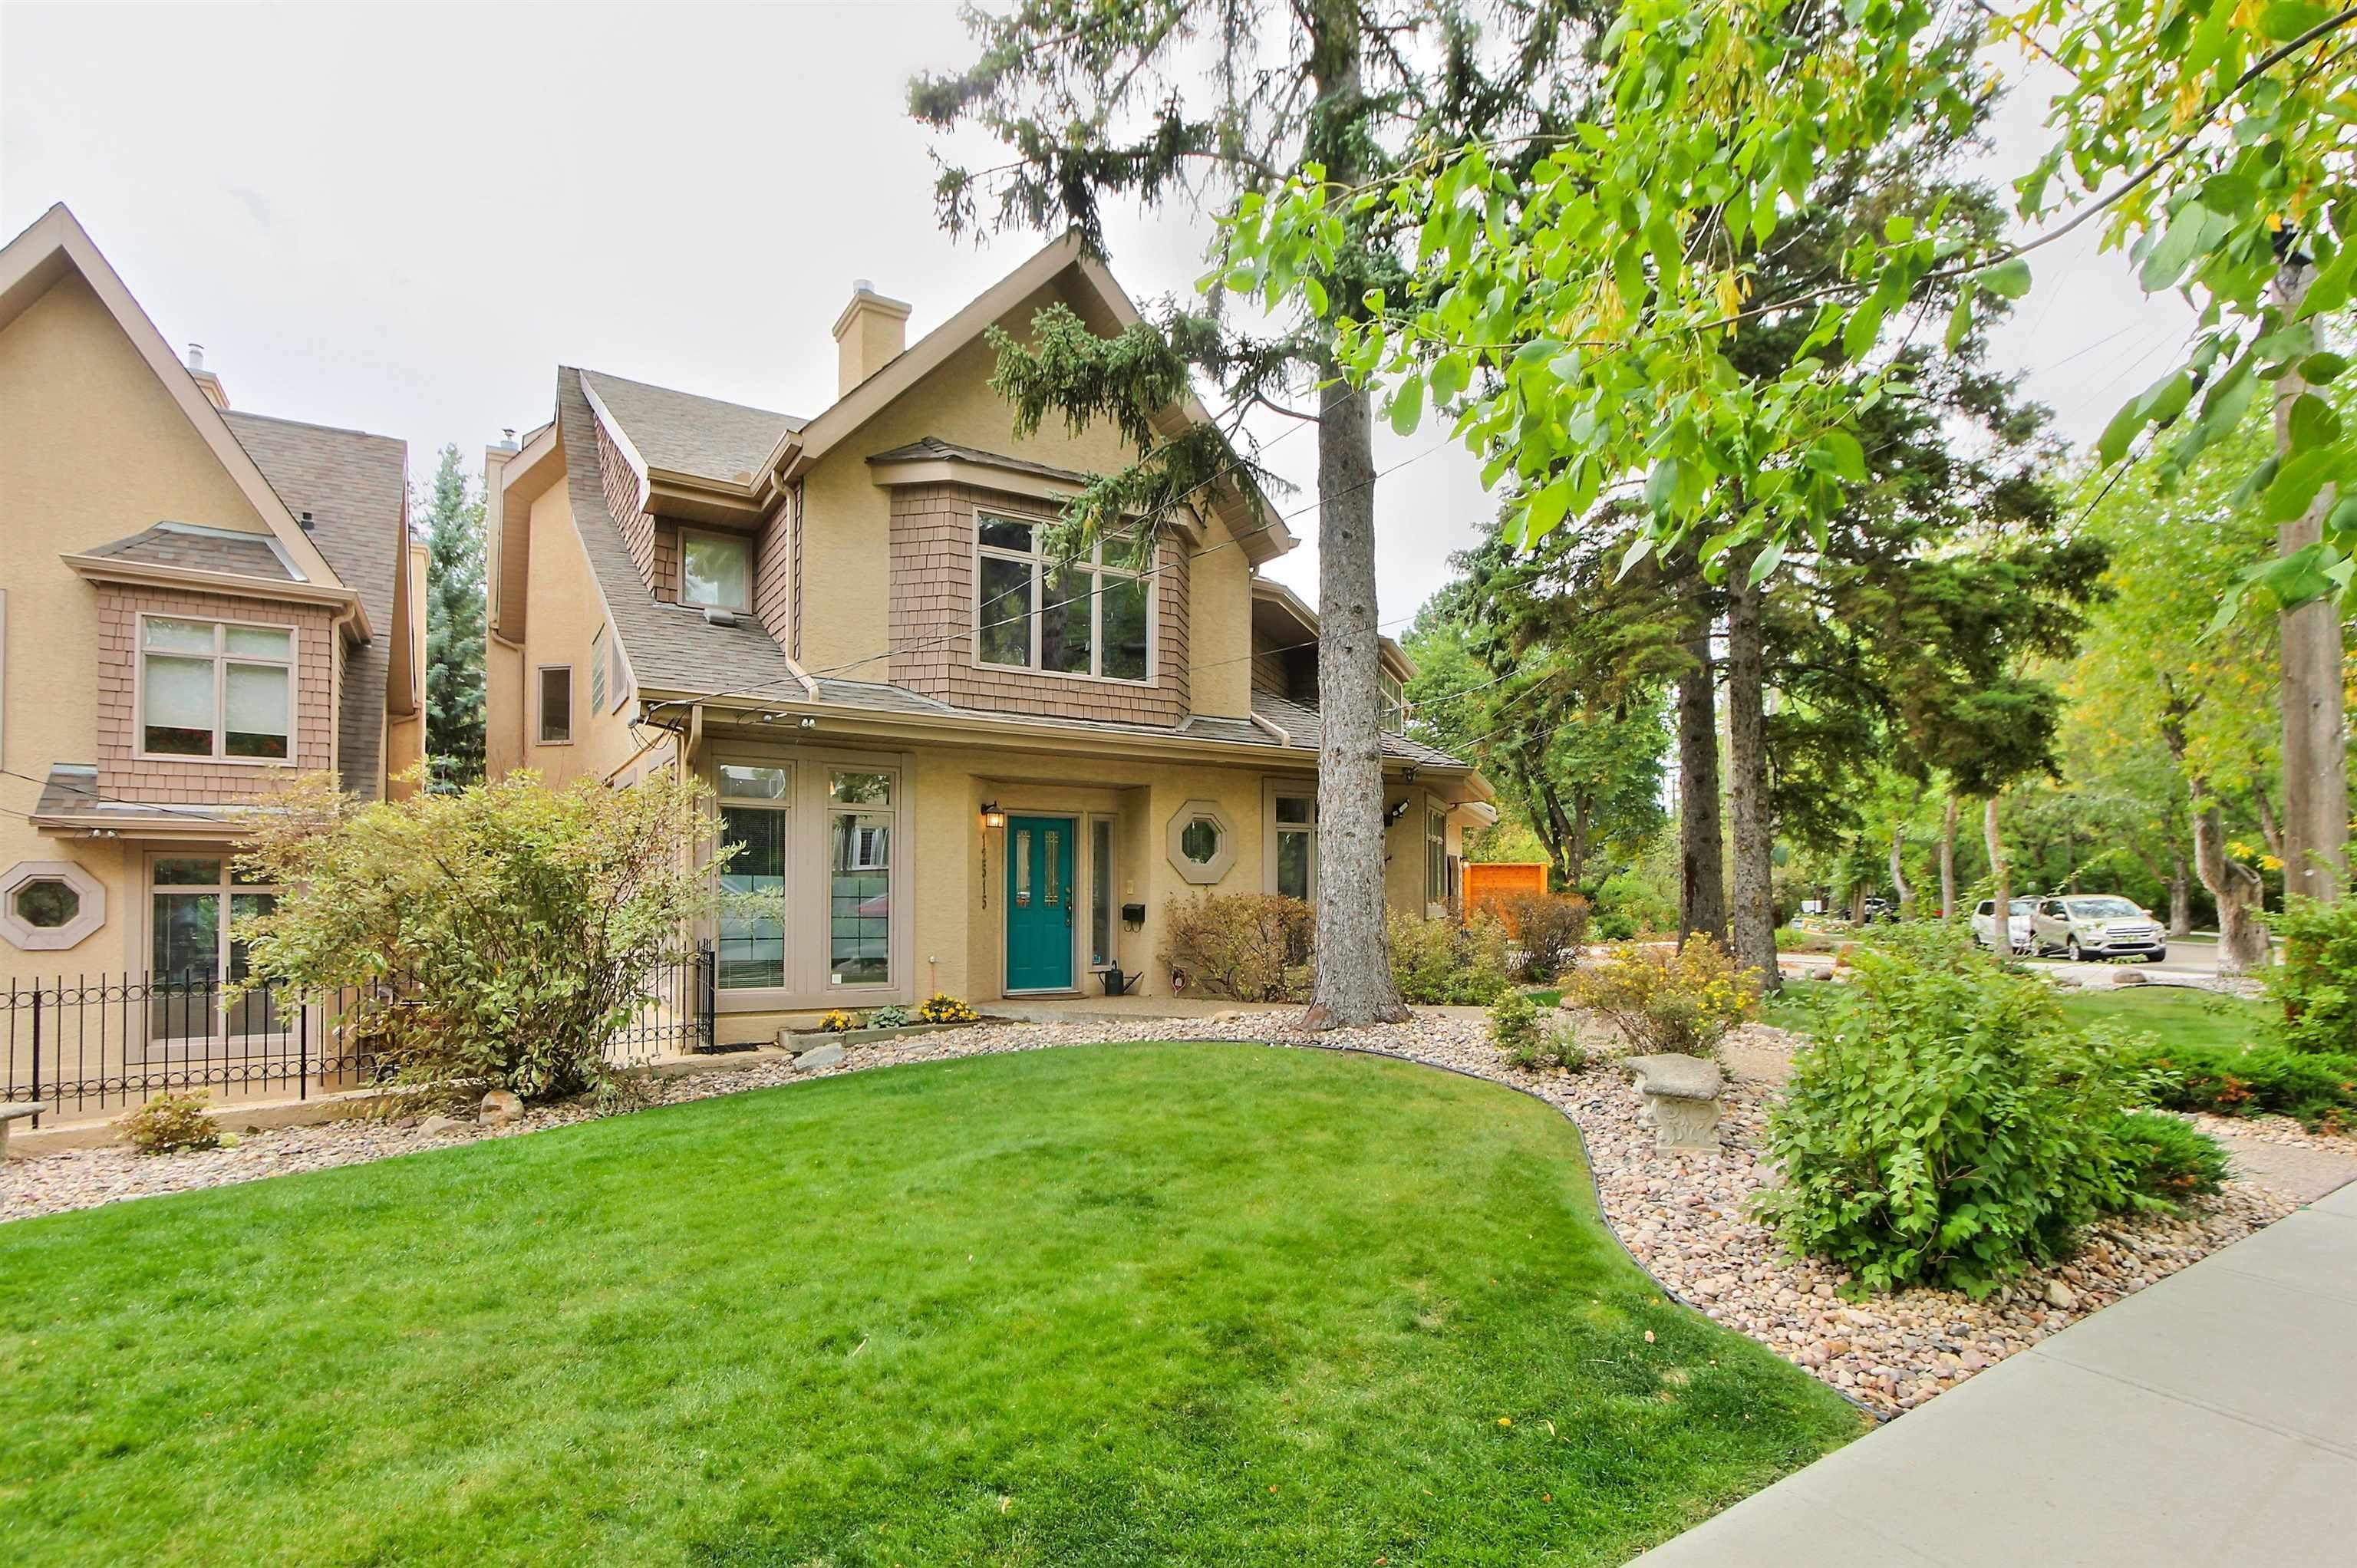 Main Photo: 12515 104 Avenue in Edmonton: Zone 07 Townhouse for sale : MLS®# E4262585